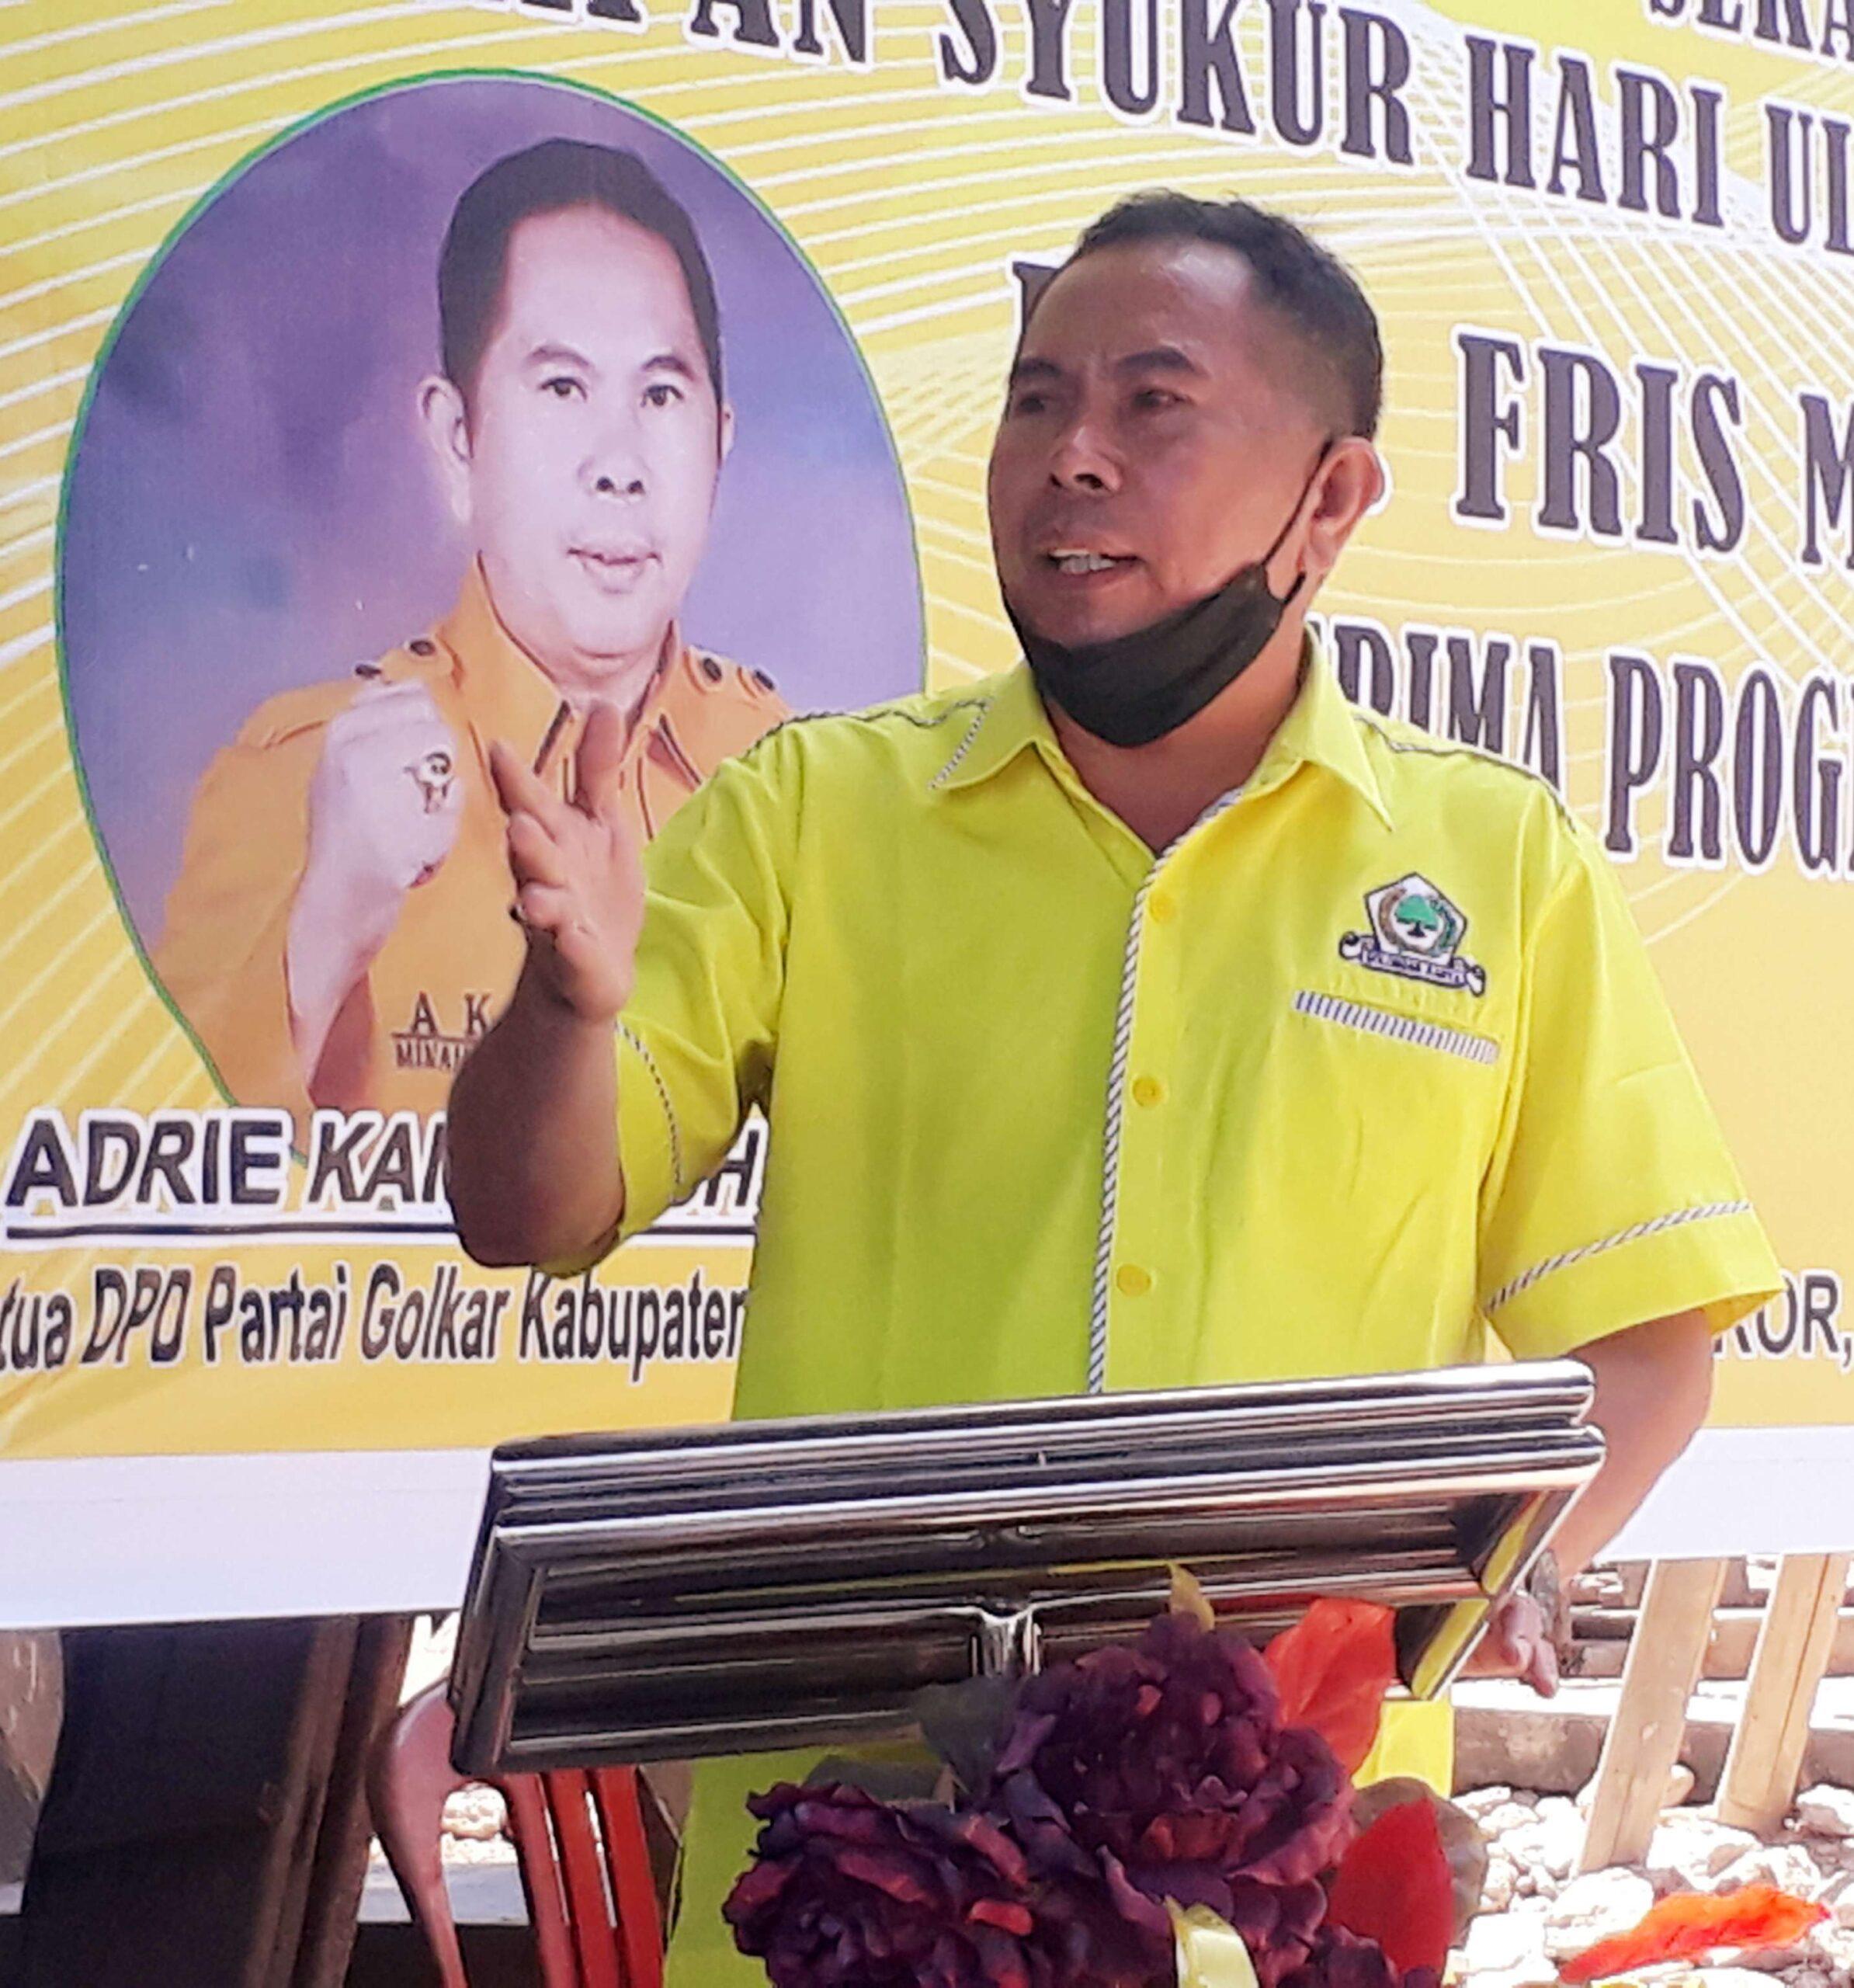 Ketua Golkar Minahasa Adrie Kamasi Doakan Warga Isoman Covid-19